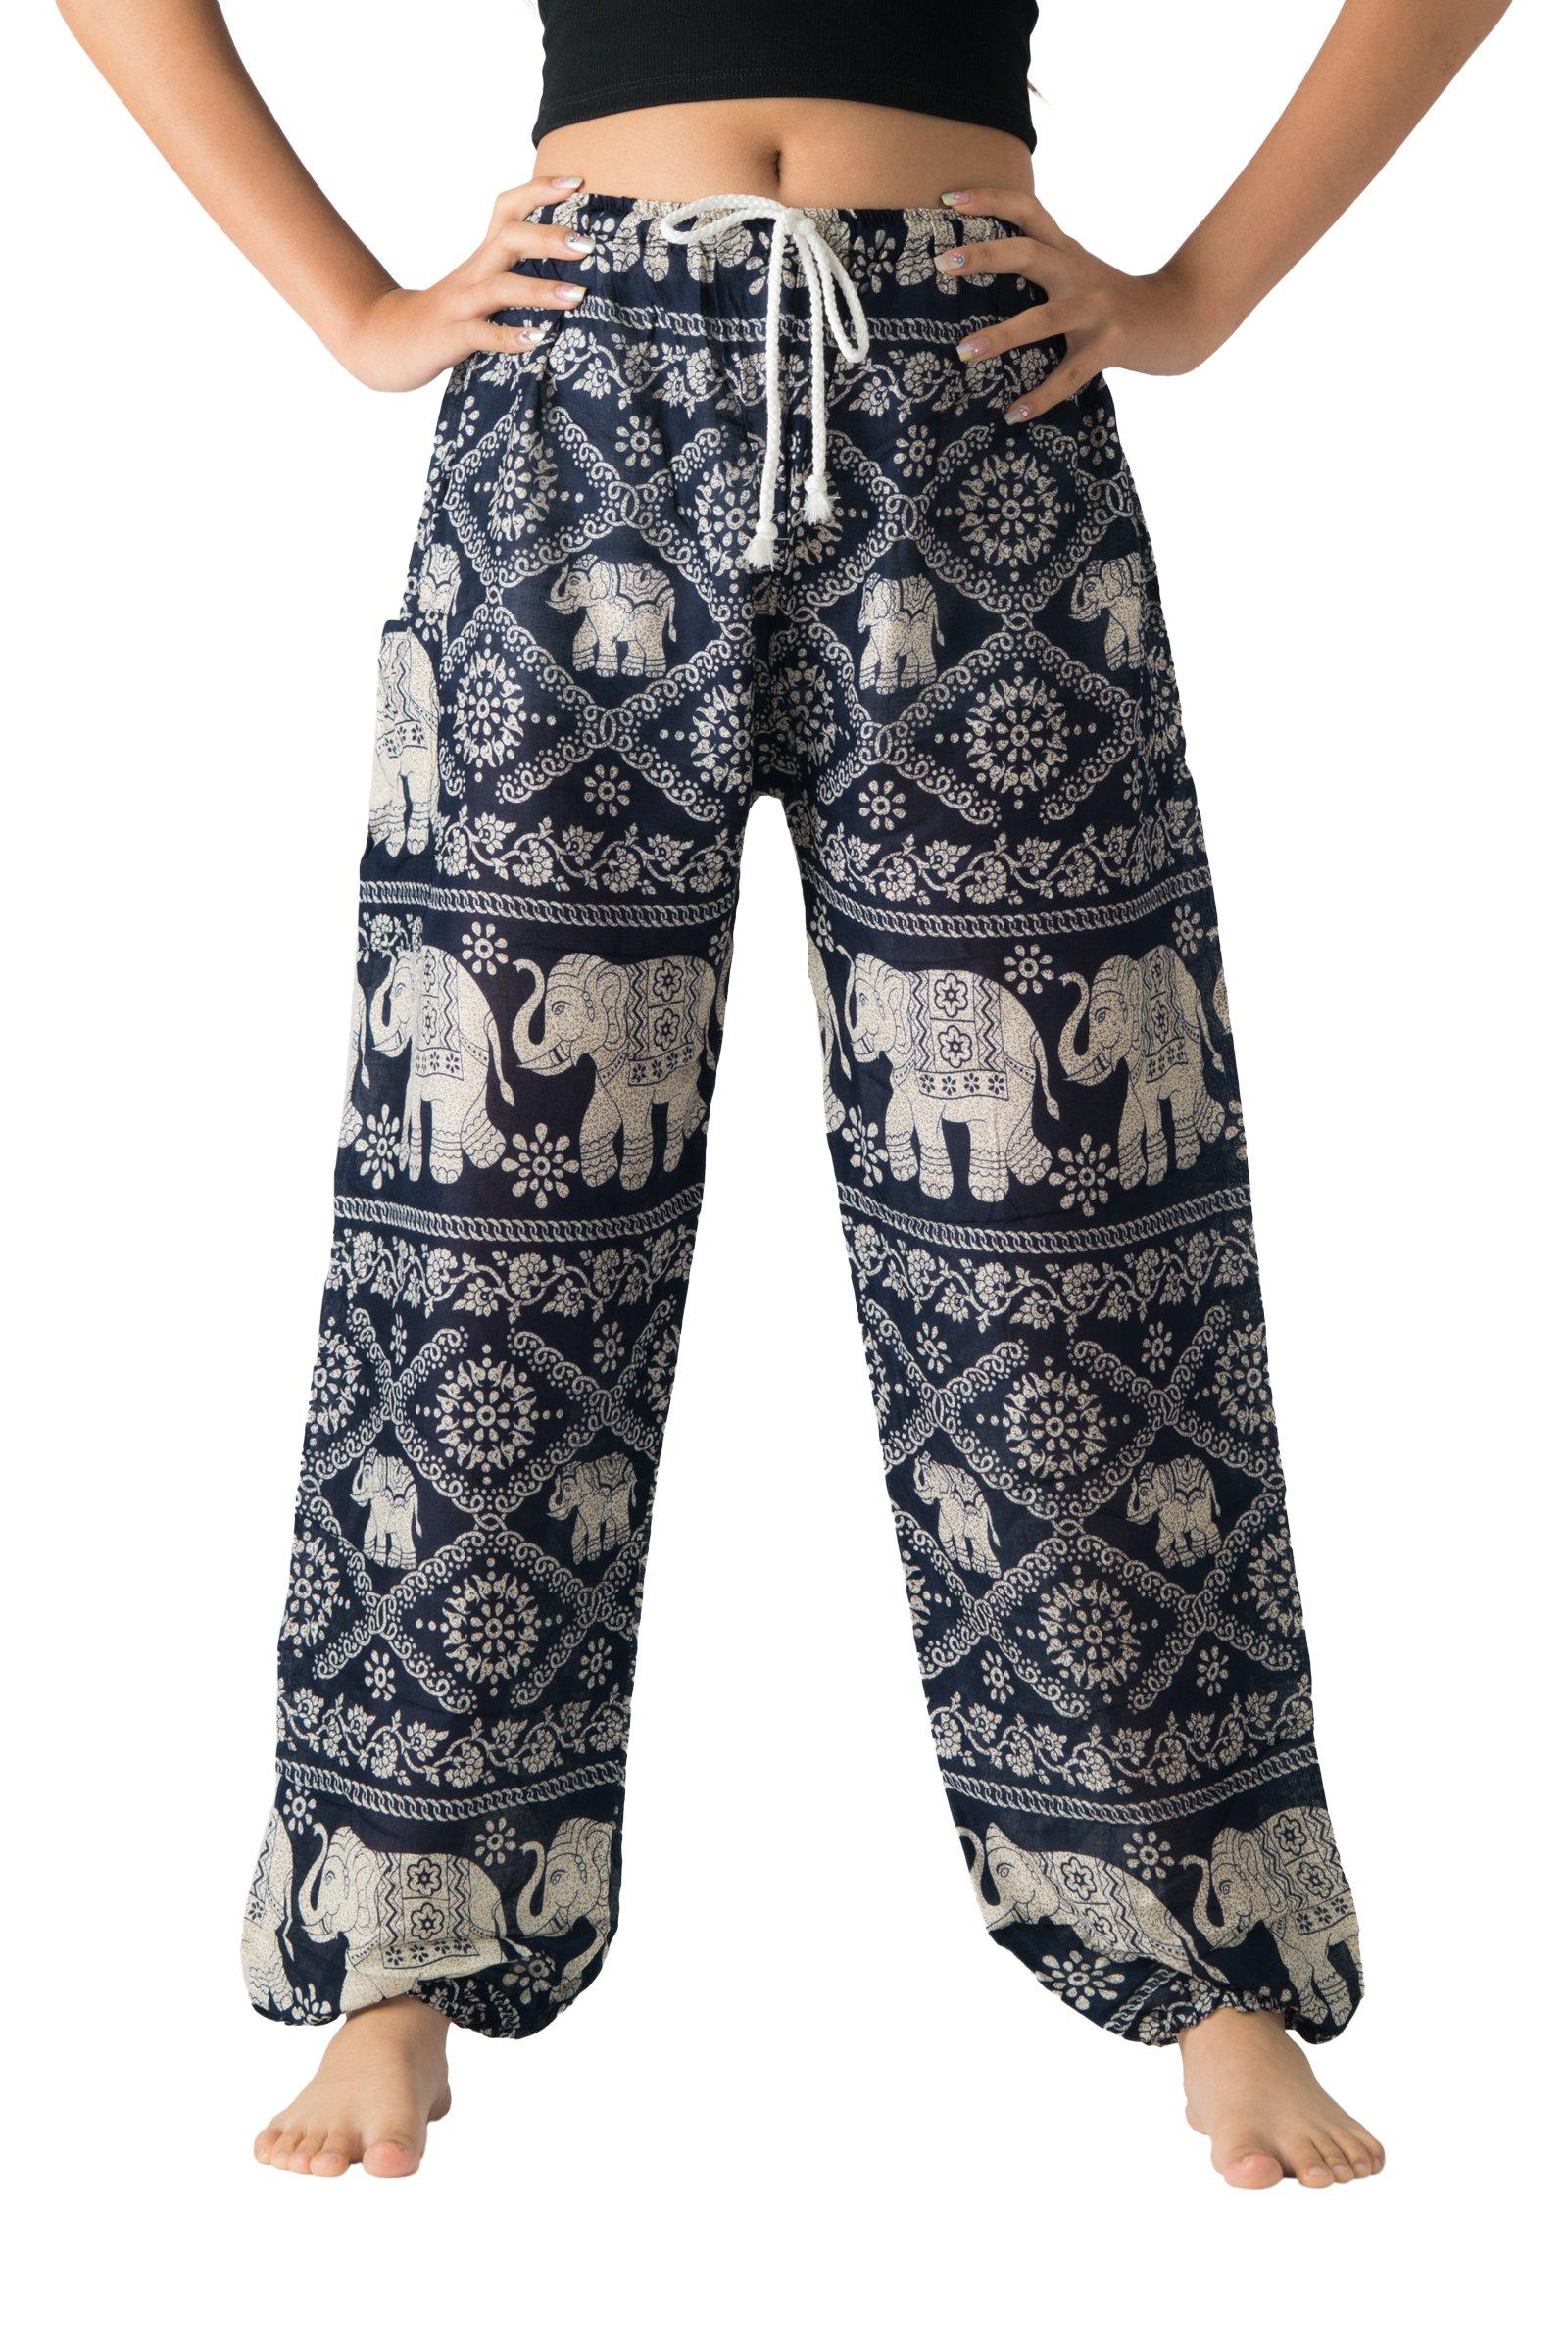 Bangkokpants Hippie Boho Pants Bohemian Unisex One Size US Size 0-12 (Blue Big Elephants)